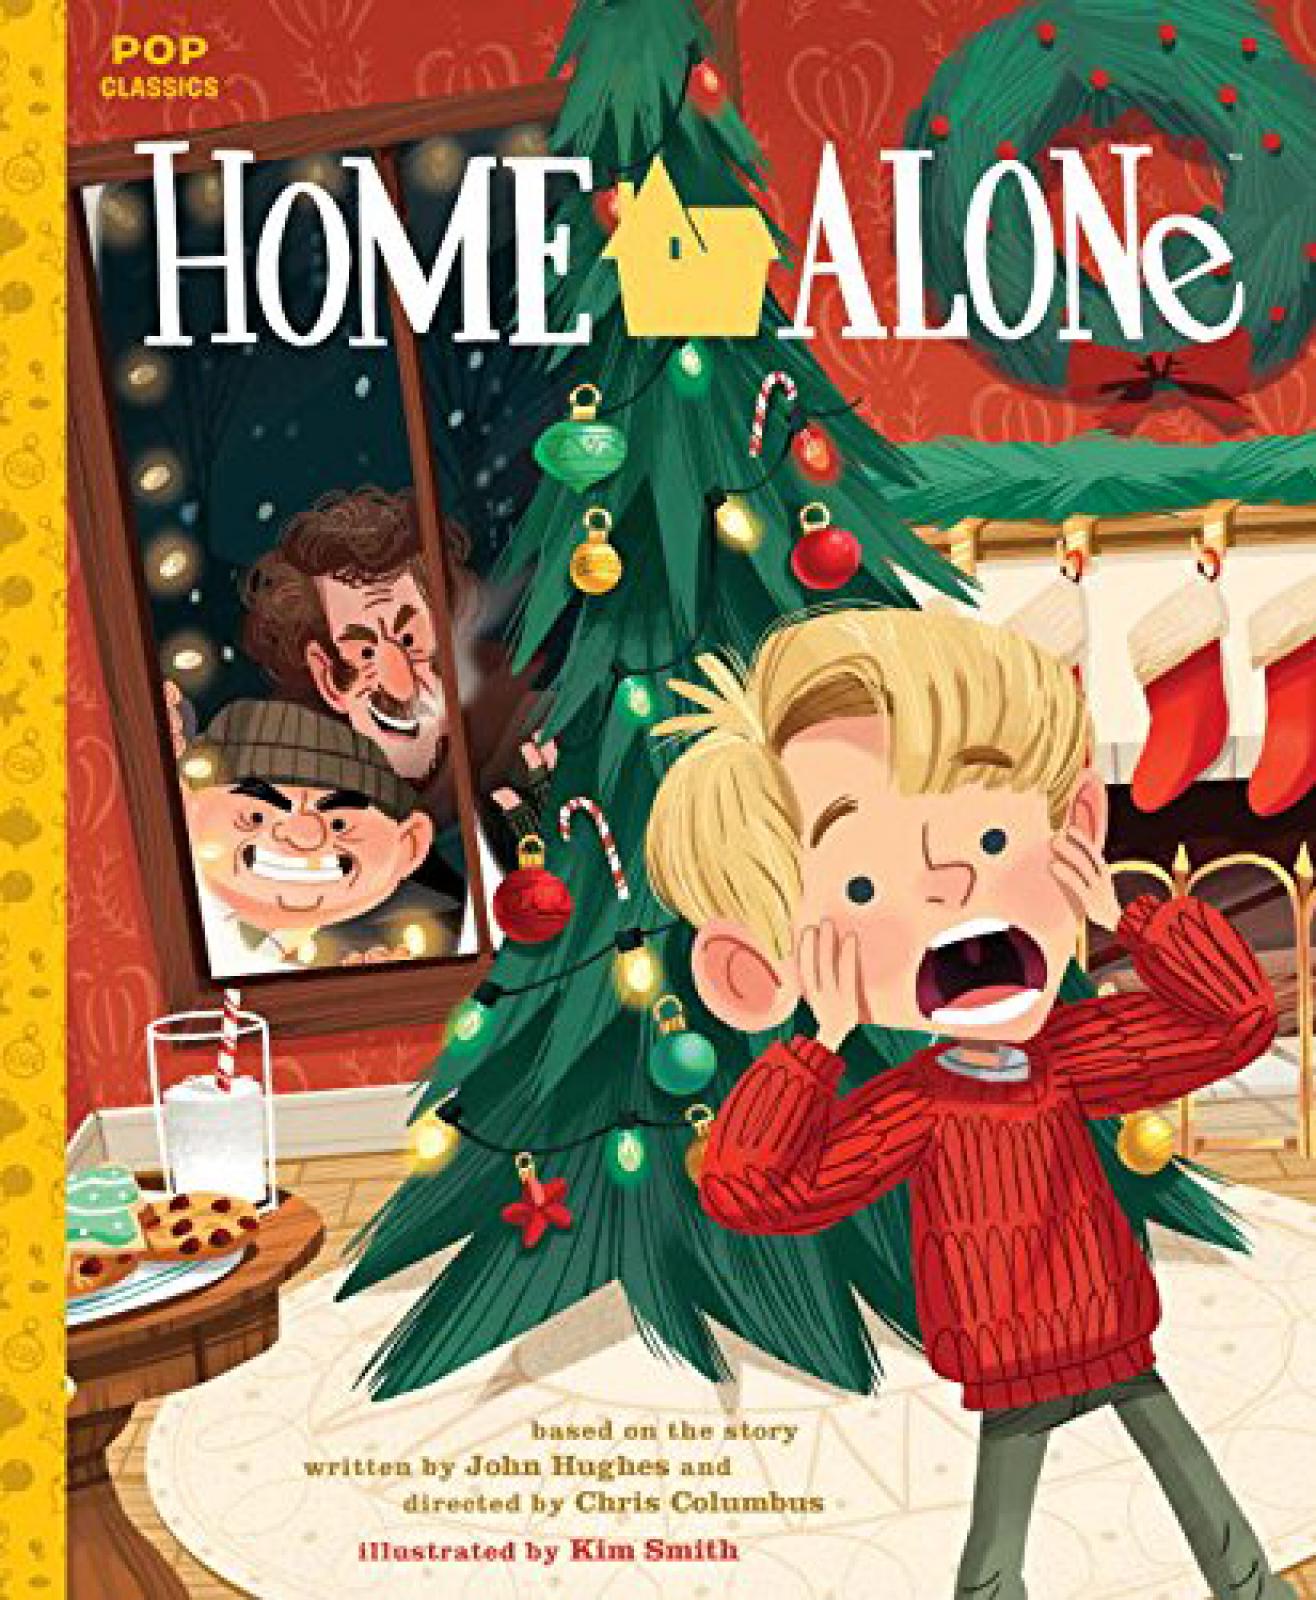 Home Alone (Pop Classics) Paperback Book